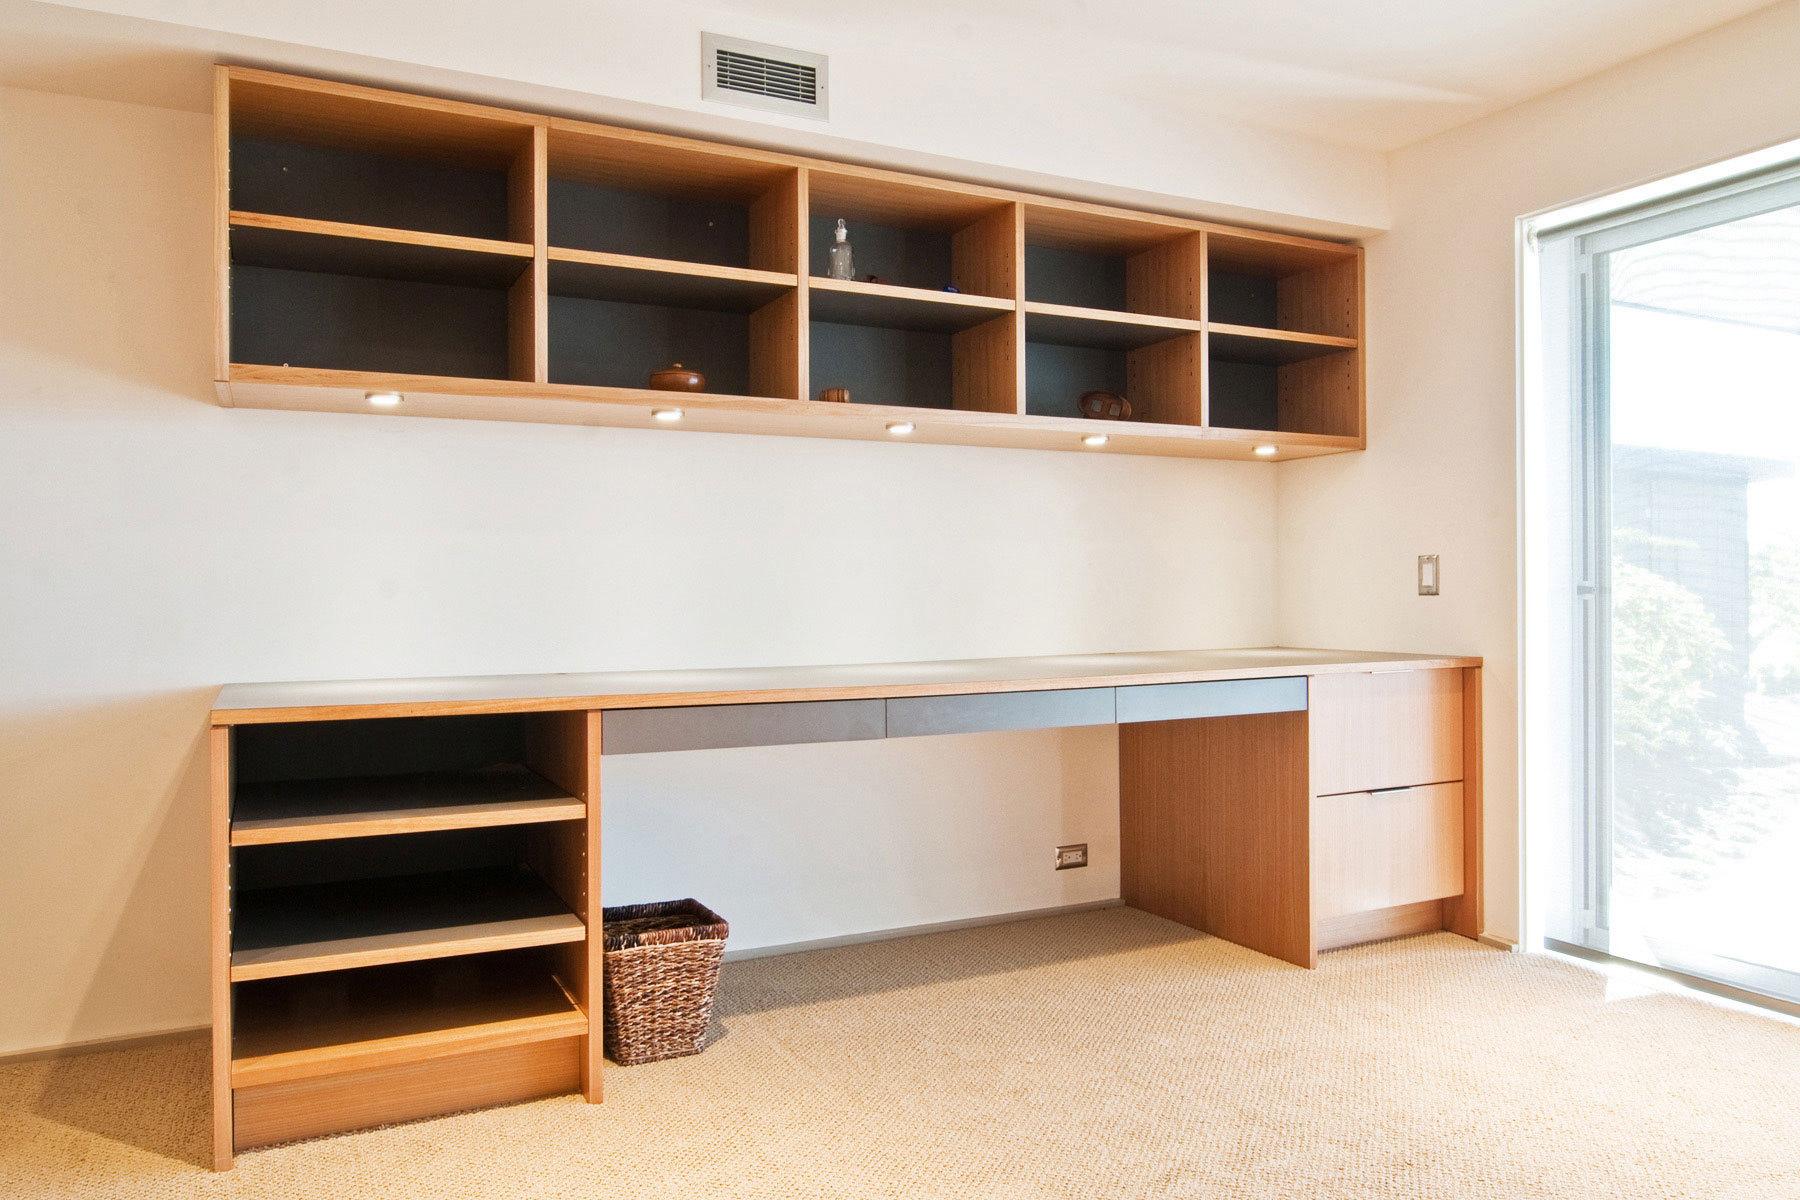 ikea-storage-cabinet-custom-office-cabinets-ikea-storage-cabinet-living-room-picture-office-cabinets.jpg